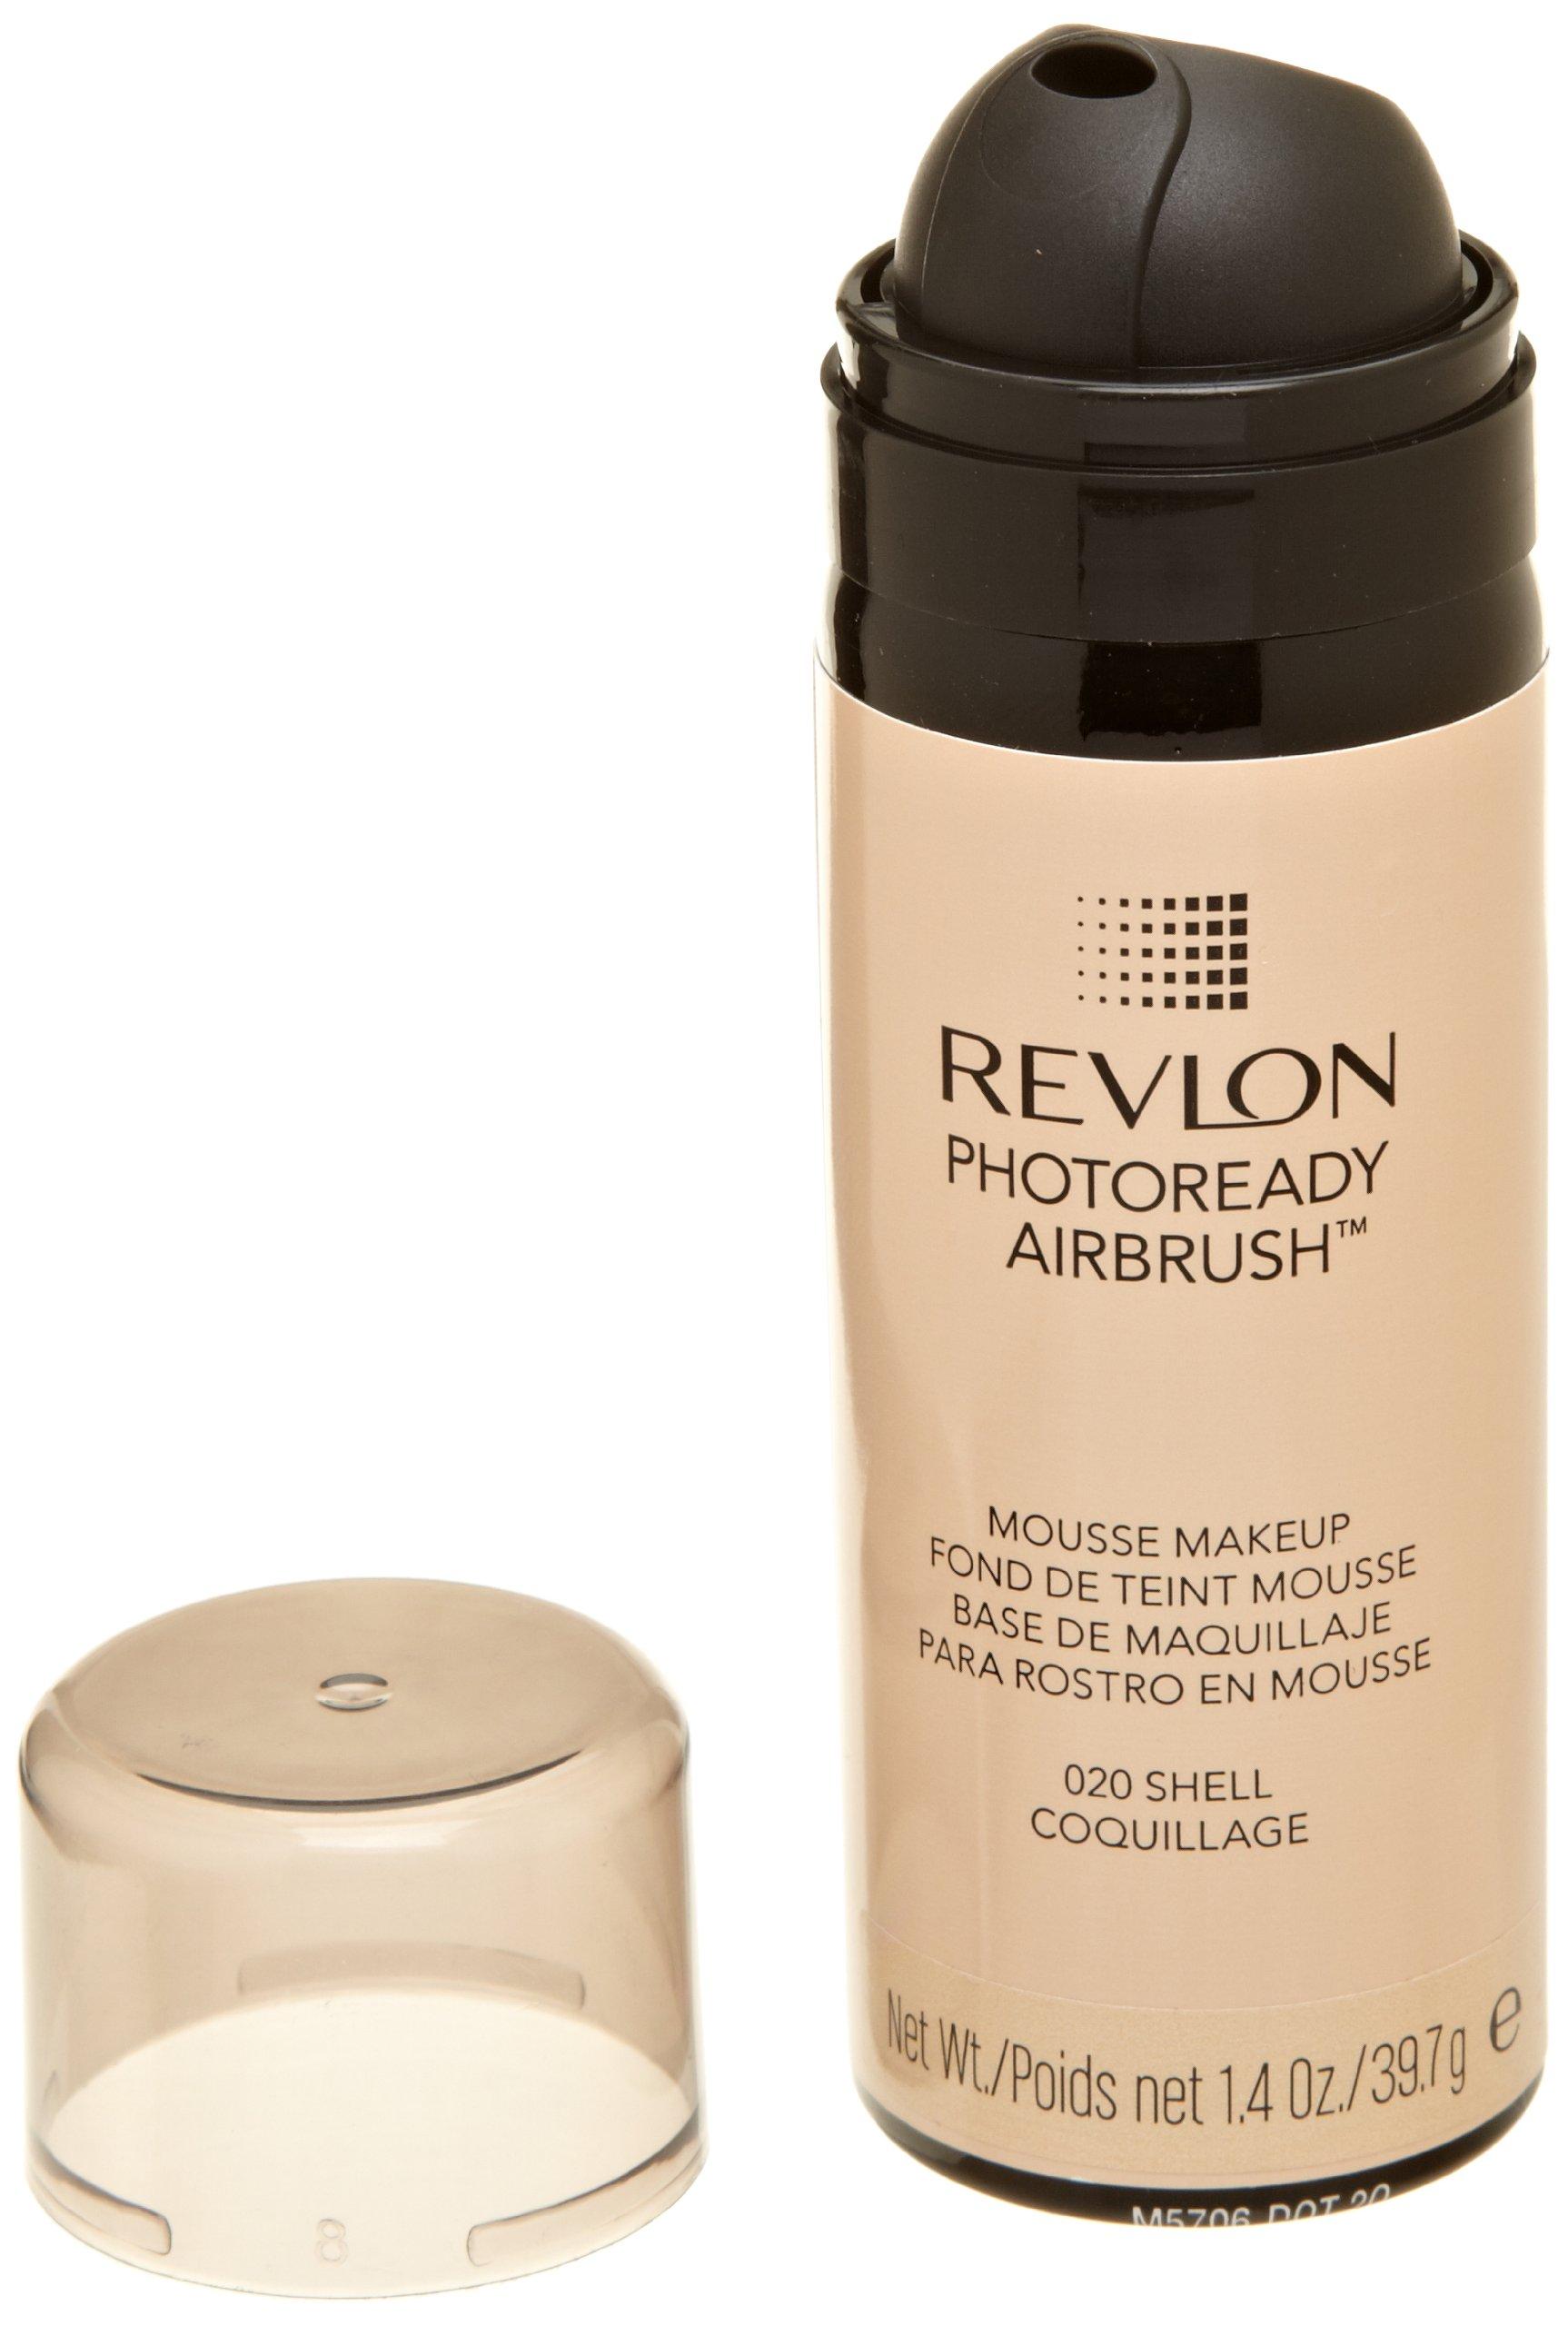 revlon photoready airbrush mousse makeup nude 1 4 ounce foundation makeup beauty. Black Bedroom Furniture Sets. Home Design Ideas